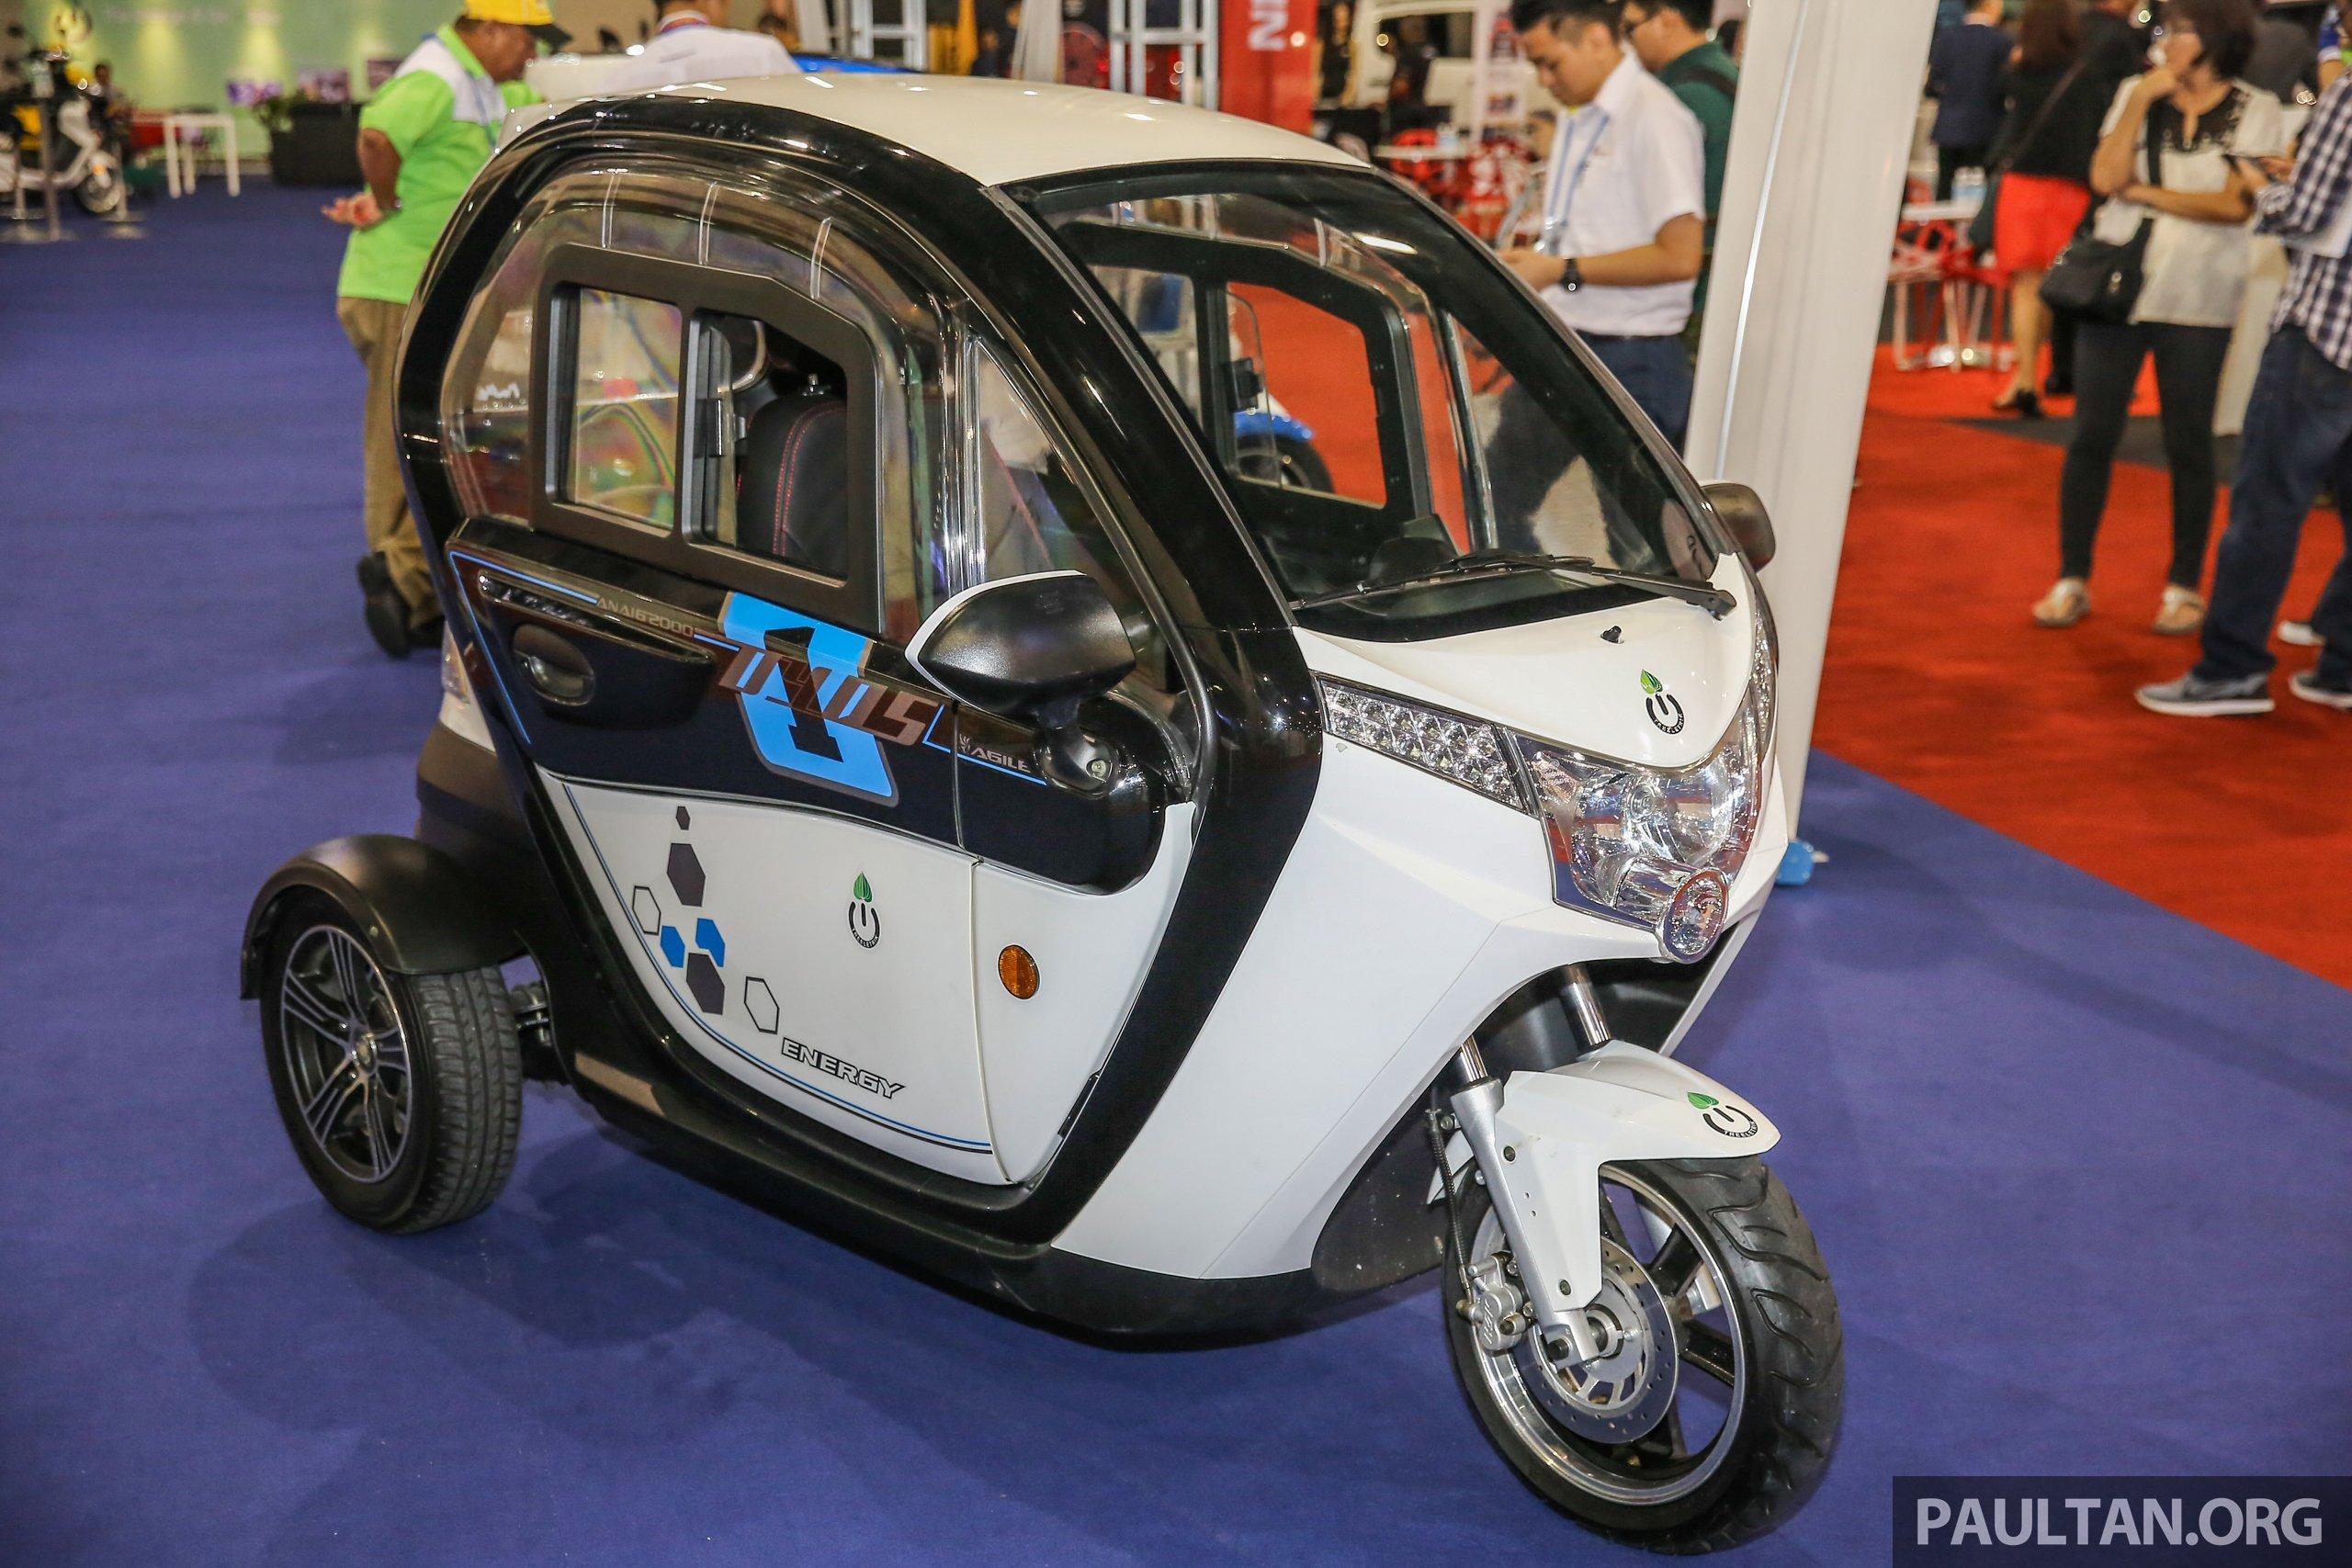 Treeletrik Ebikes On Display At Auto Show Prices Start From RM - Auto show prices